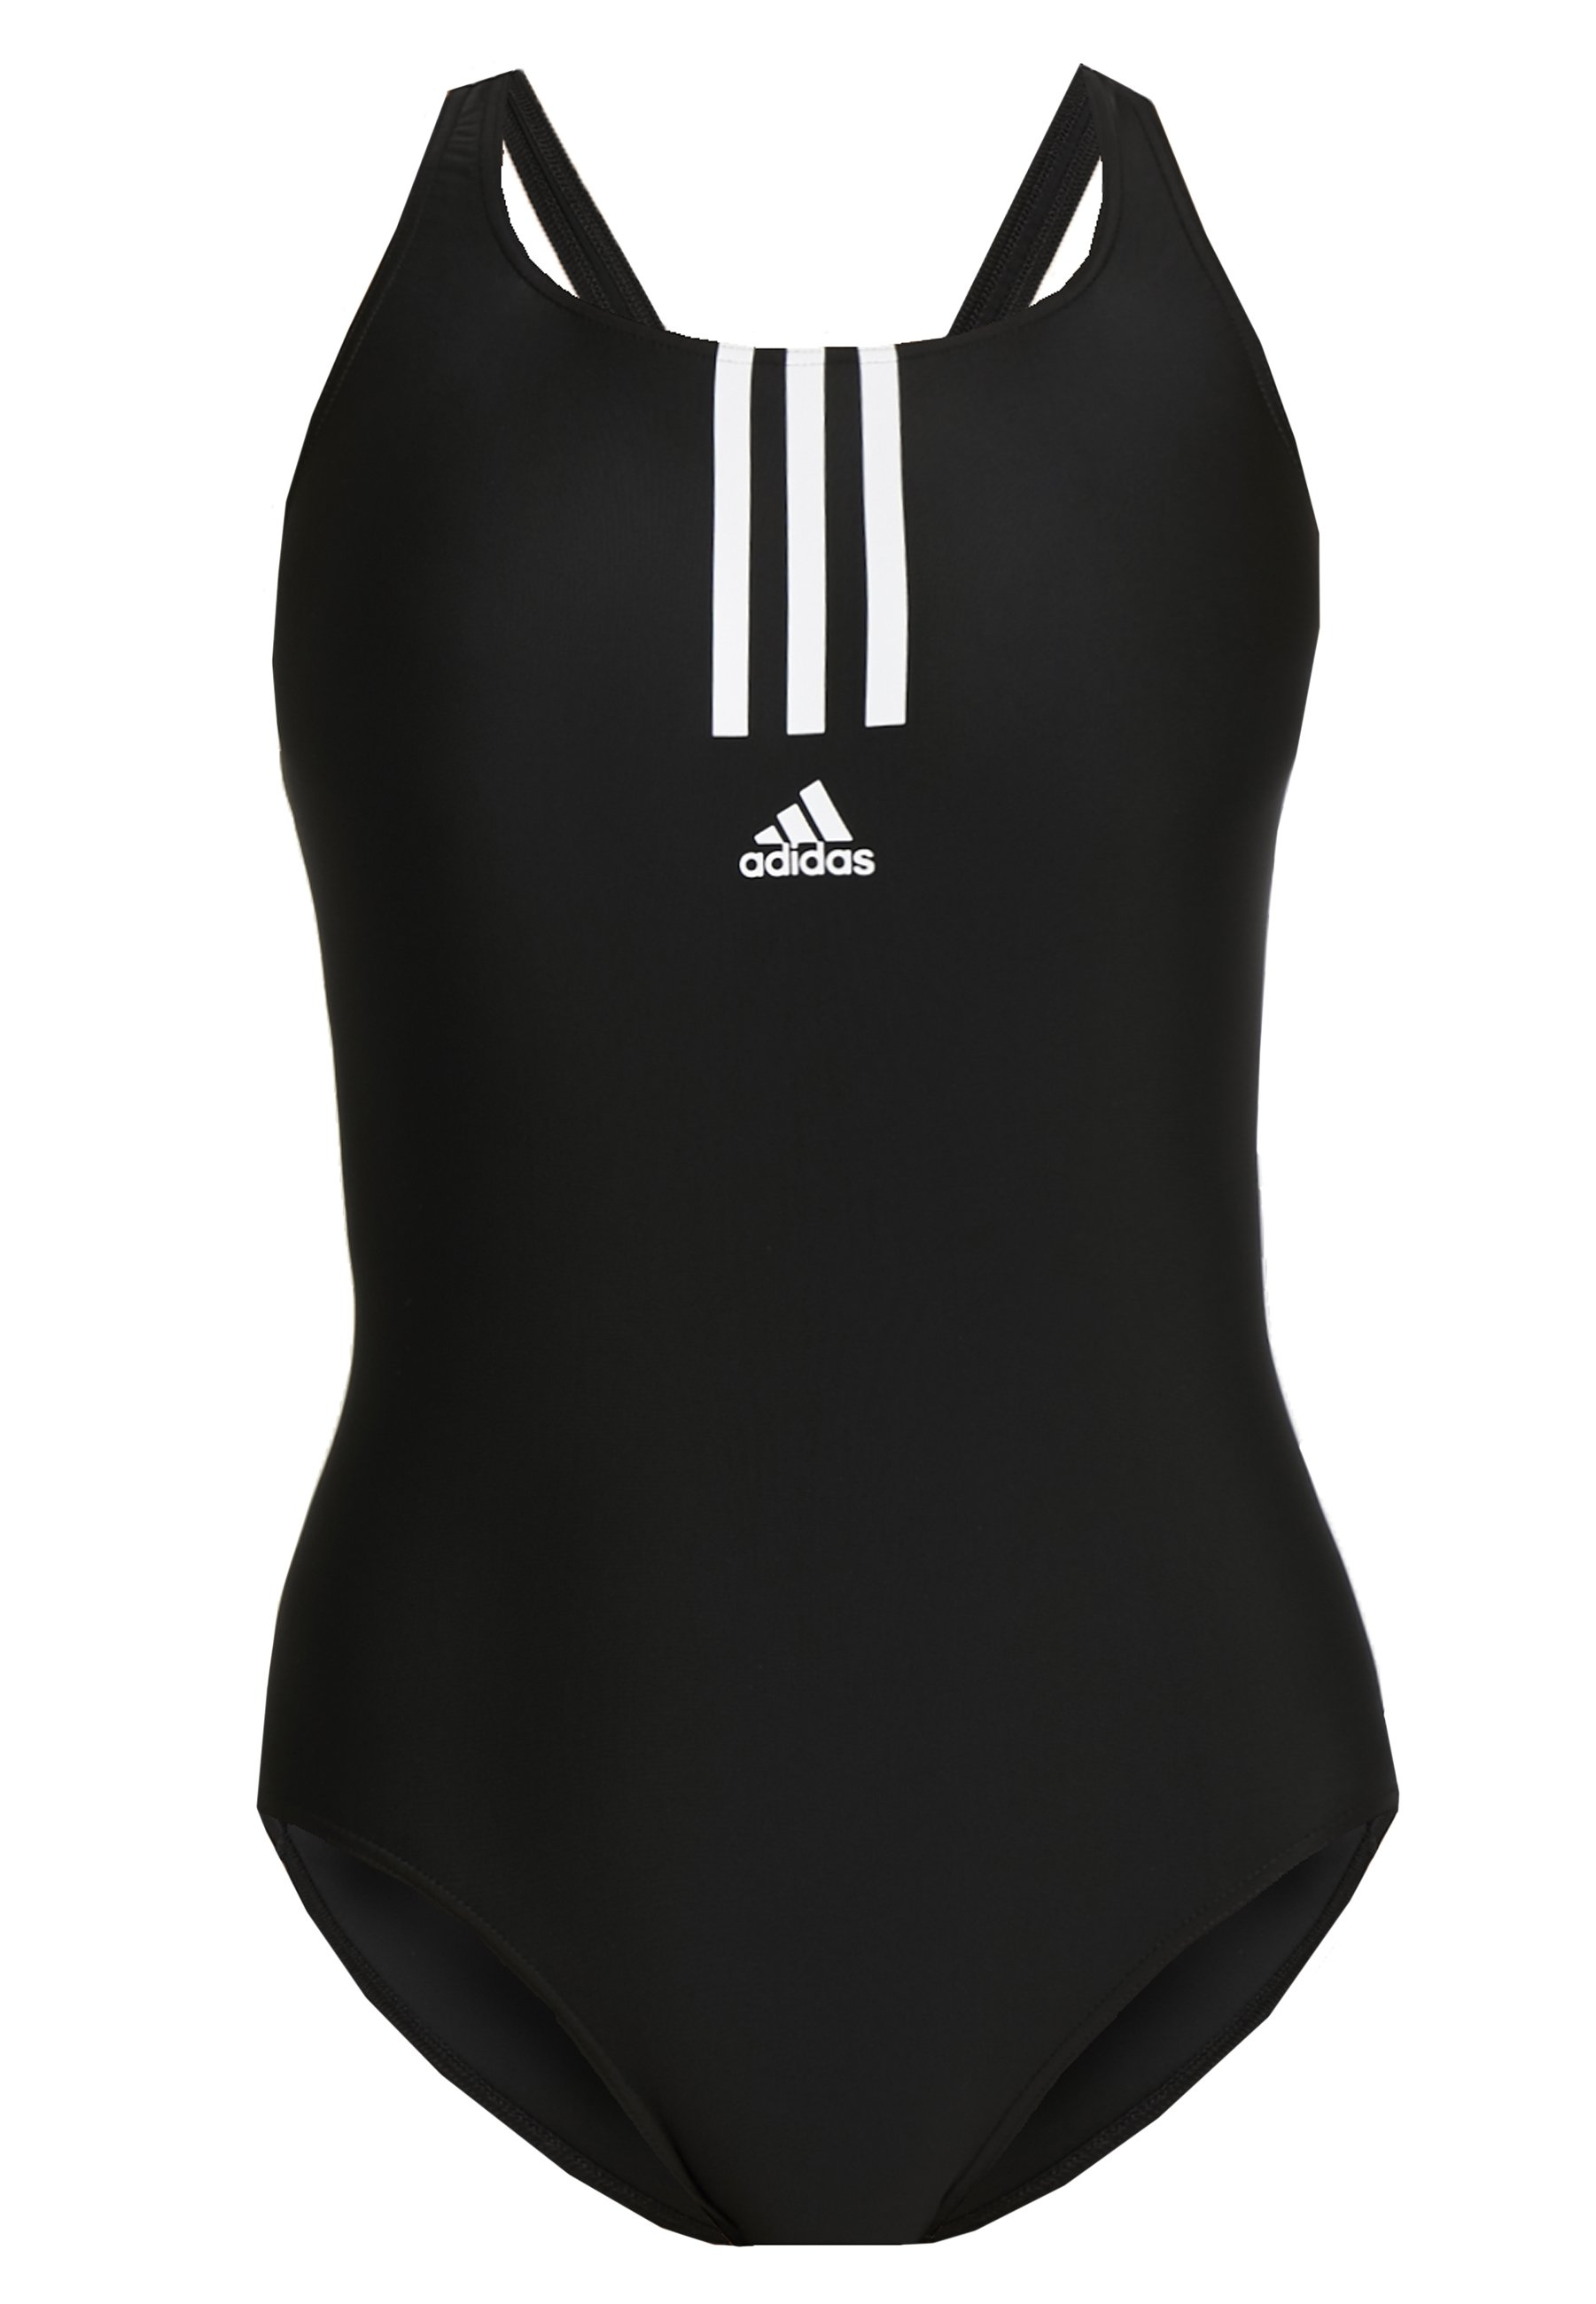 Adidas Performance Badedragter - Black/white